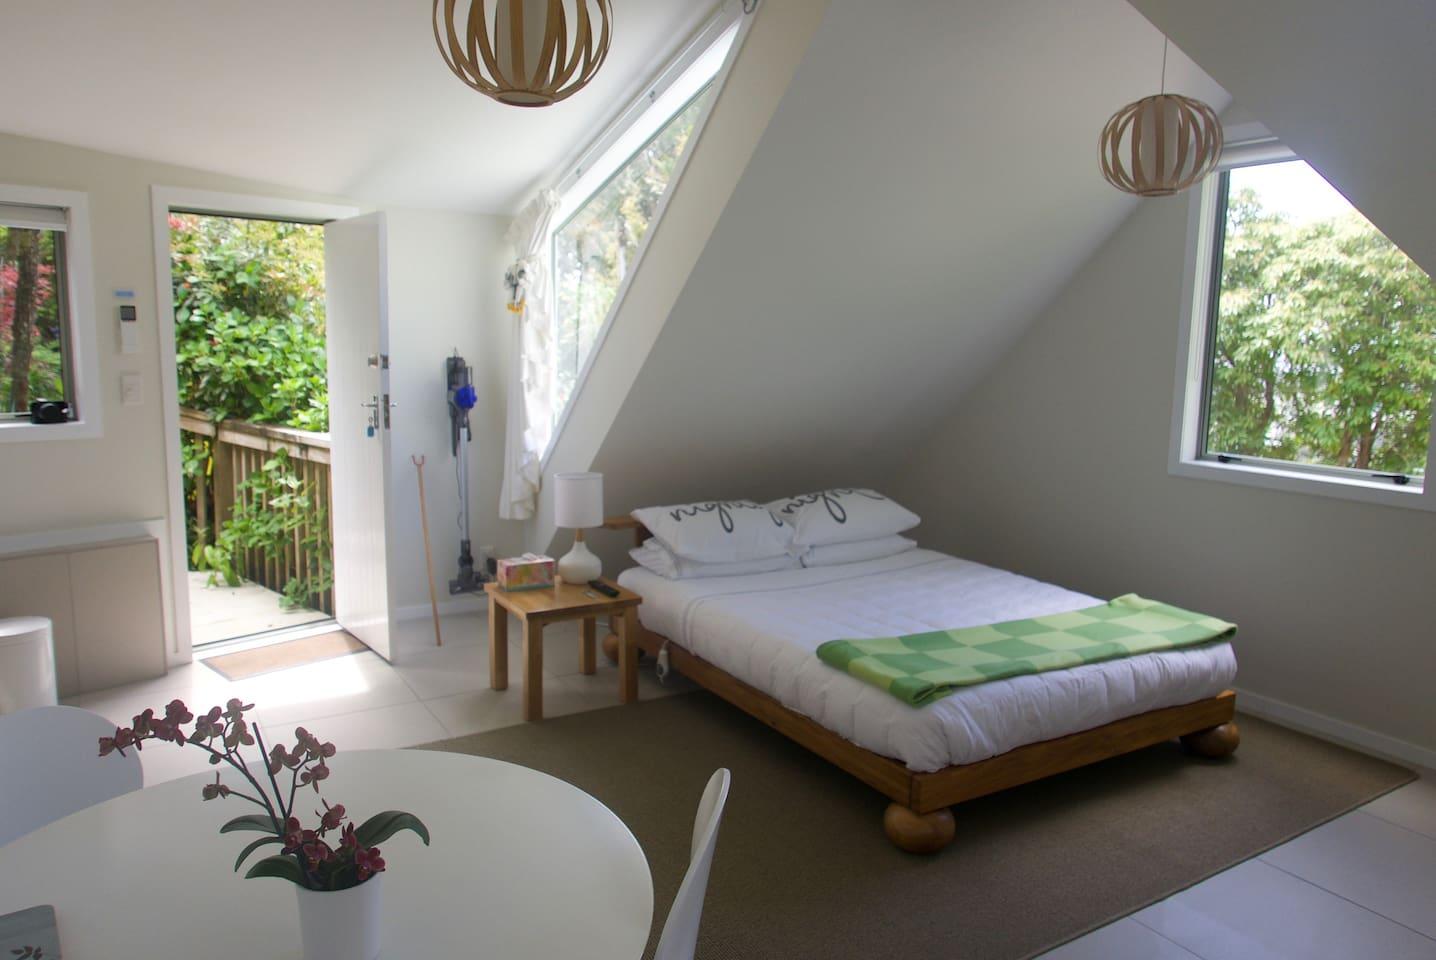 A bright, airy, open-plan studio apartment